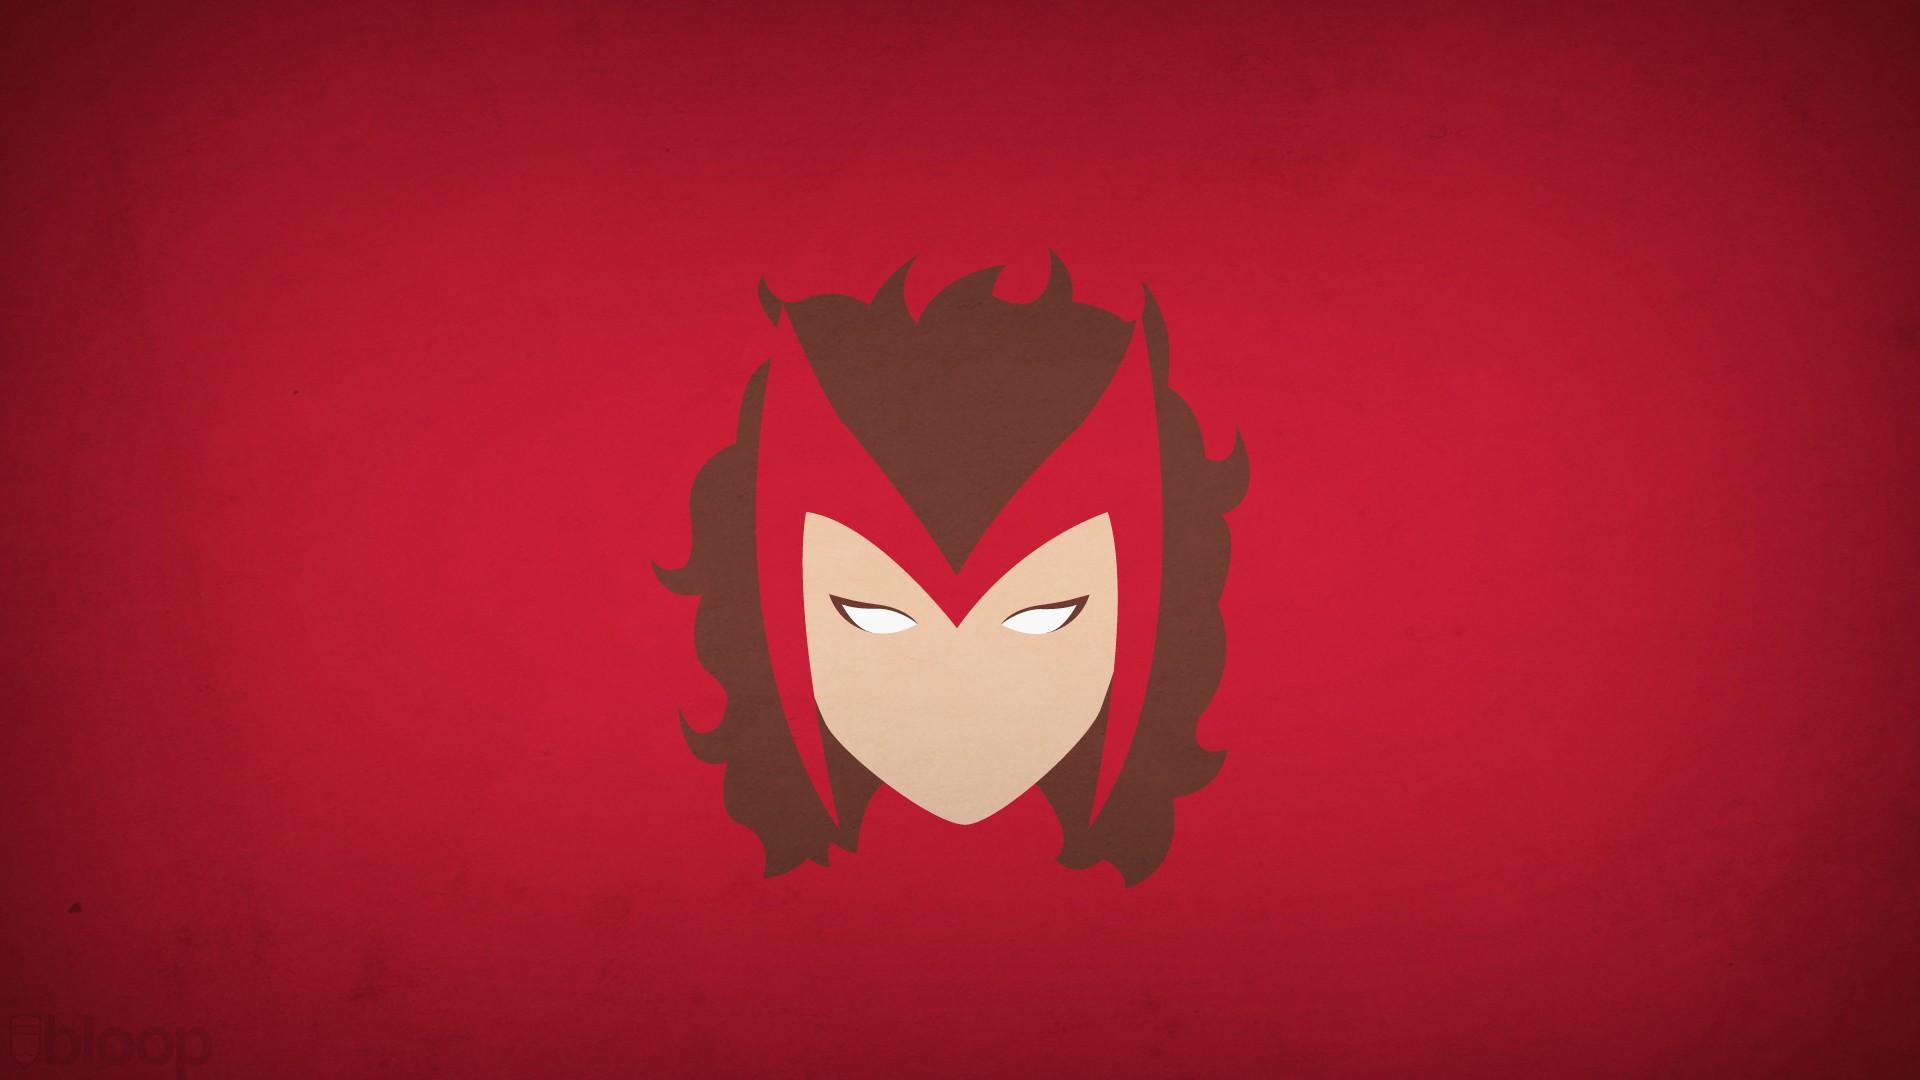 Good Wallpaper Marvel Face - illustration-simple-background-minimalism-red-logo-red-background-hero-Marvel-Comics-Scarlet-Witch-Blo0p-computer-wallpaper-font-organ-219412  Picture_274156.jpg